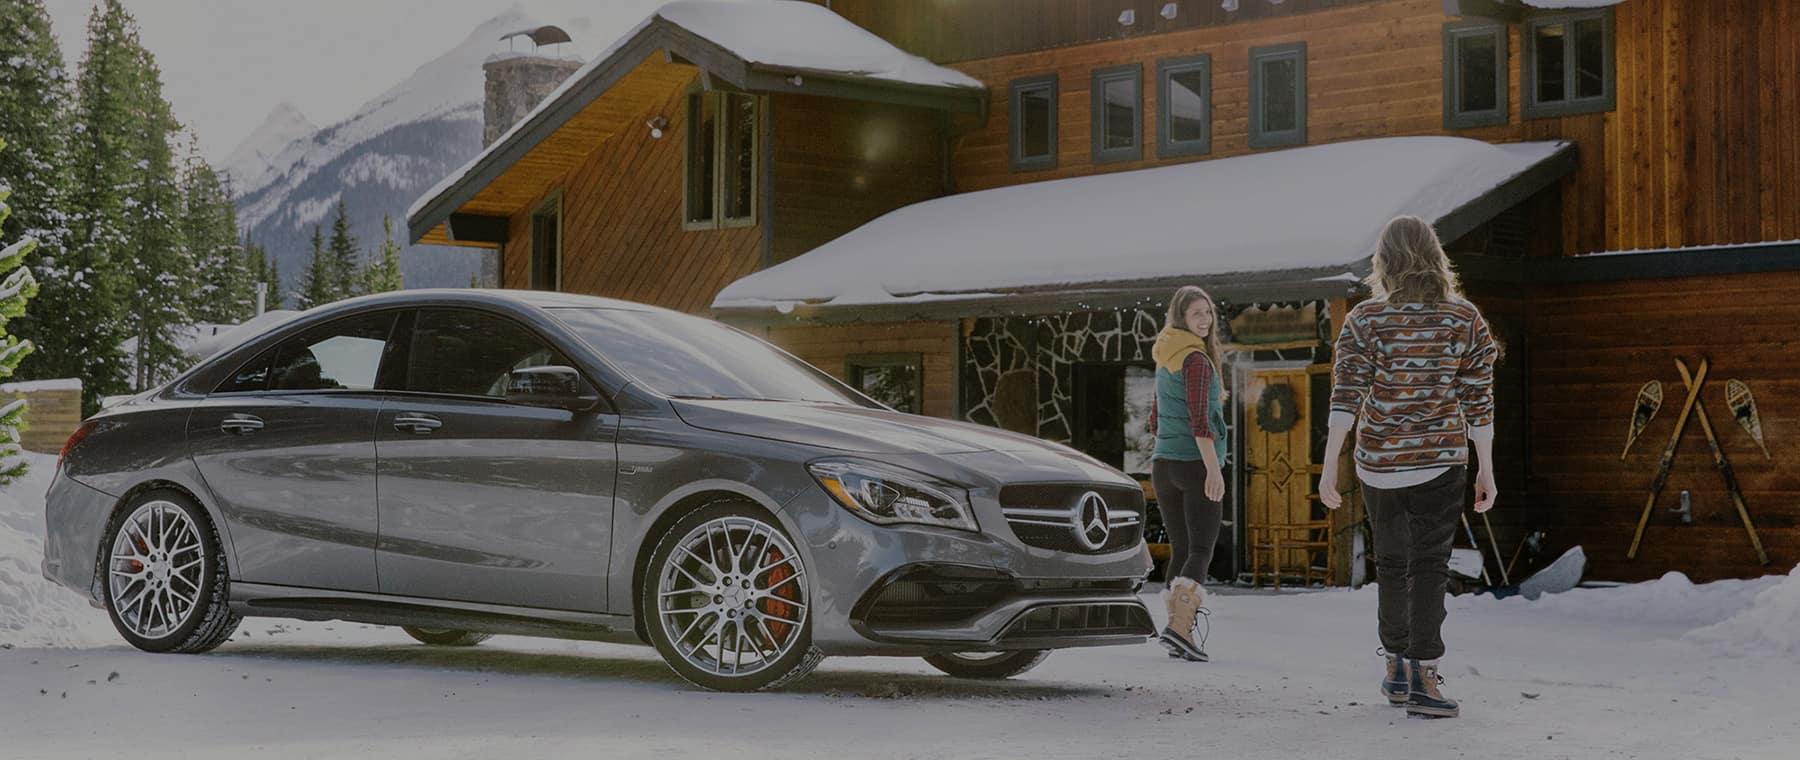 Mercedes benz markham mercedes benz dealership in for Mercedes benz retail careers